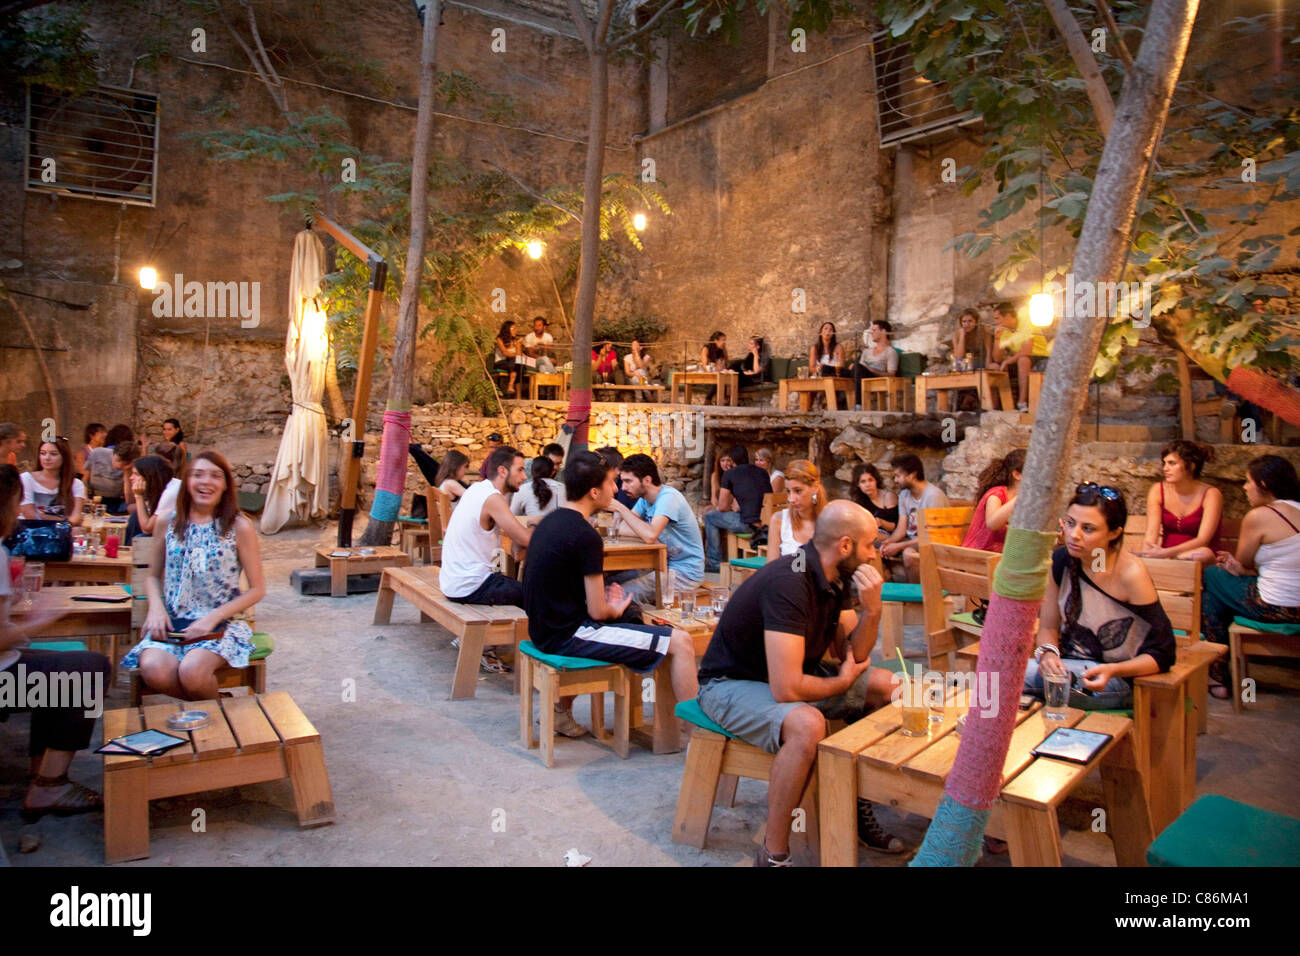 People At Six Dogs A Trendy Outdoor Bar In The Monastiraki Area Six